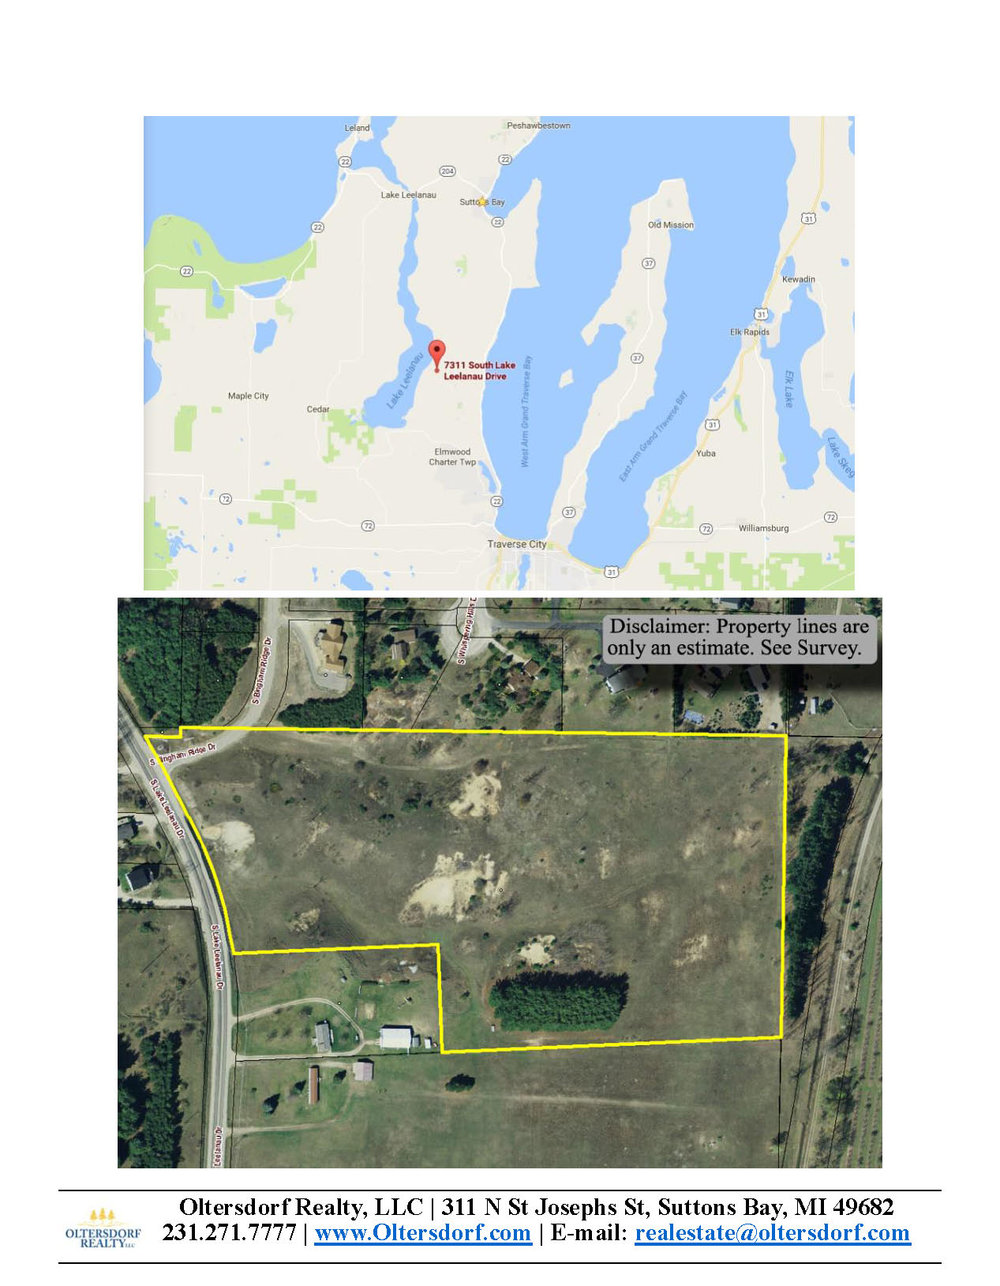 7311 S Lake Leelanau Drive, Traverse City Acreage for sale in Leelanau County by Oltersdorf Realty LLC (5).jpg